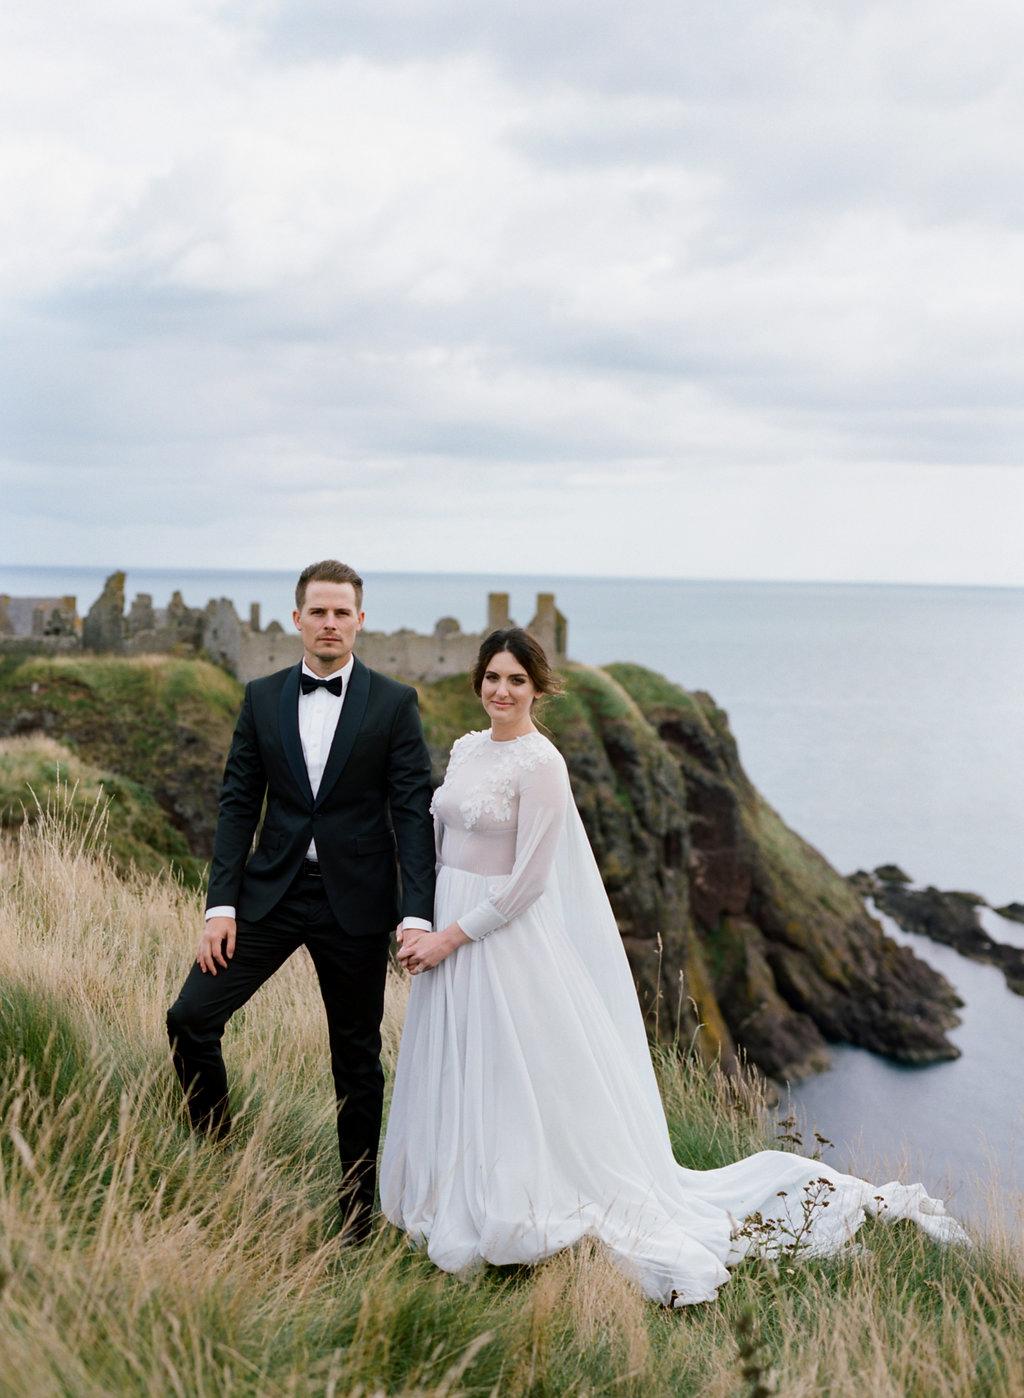 Scotland-Prewedding-highlands-castle-Engagment-Photos-Katie-Grant (117 of 139).jpg